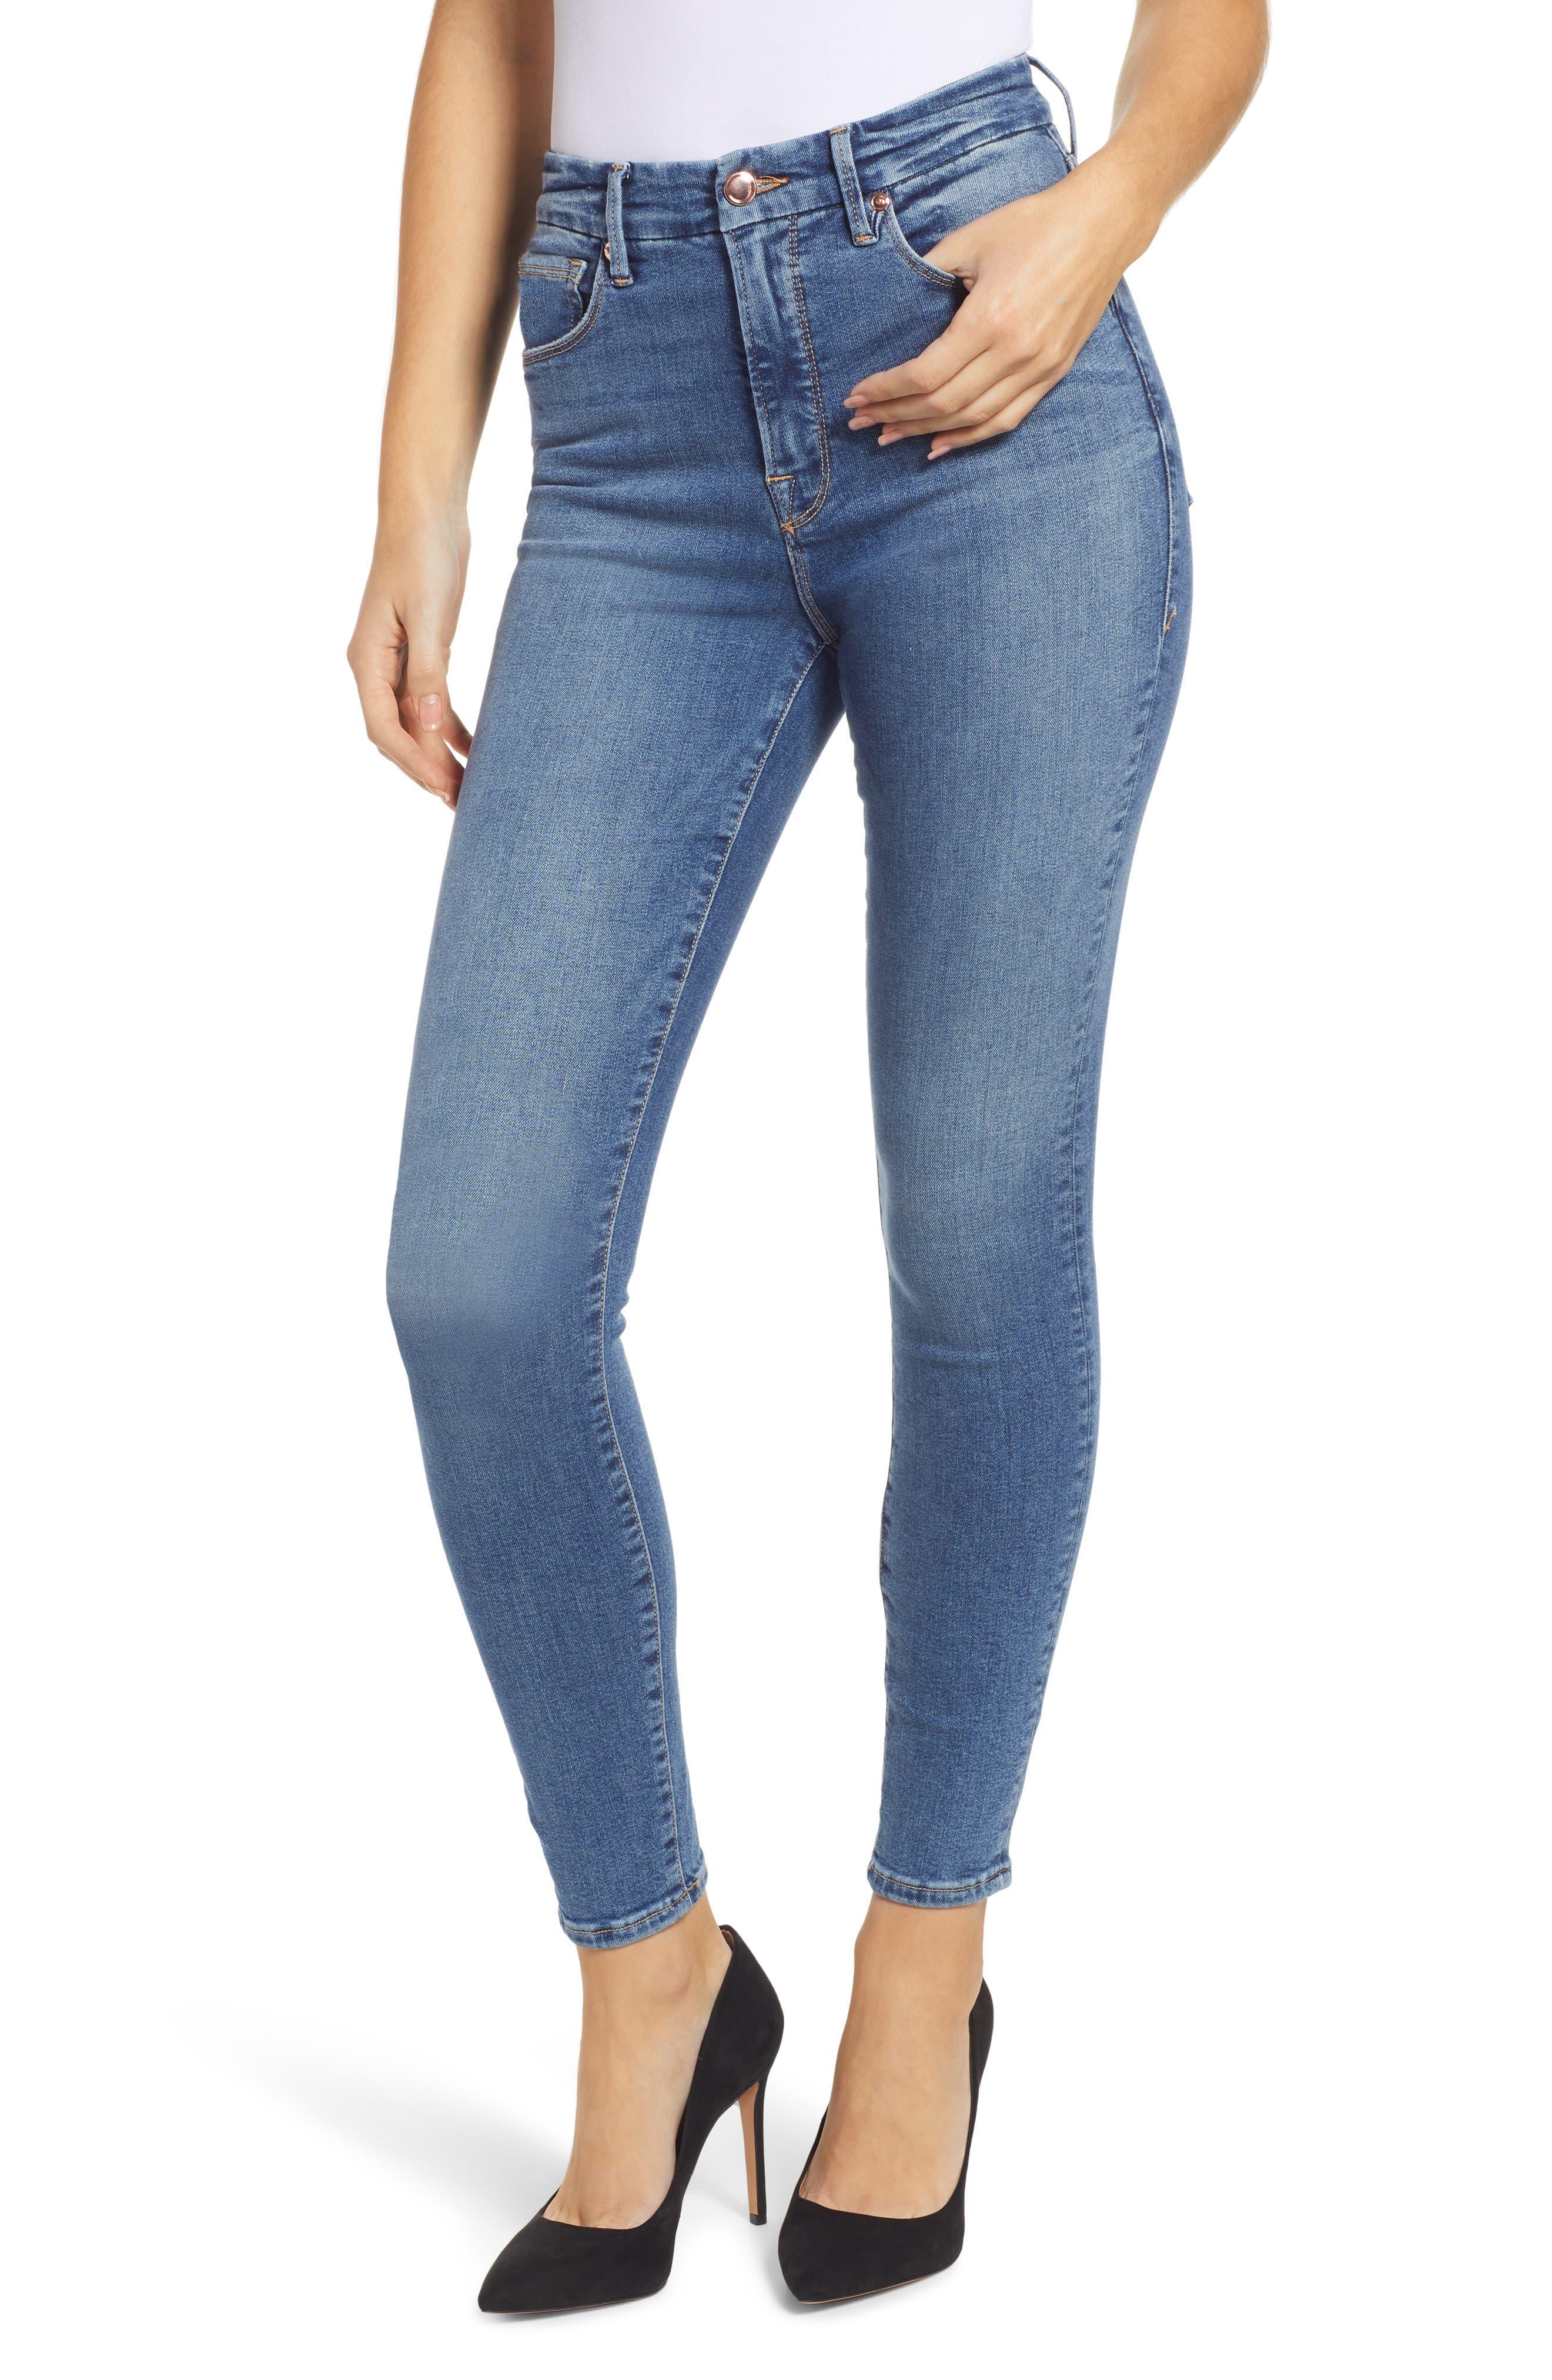 Women's Good American Good Waist High Waist Ankle Skinny Jeans